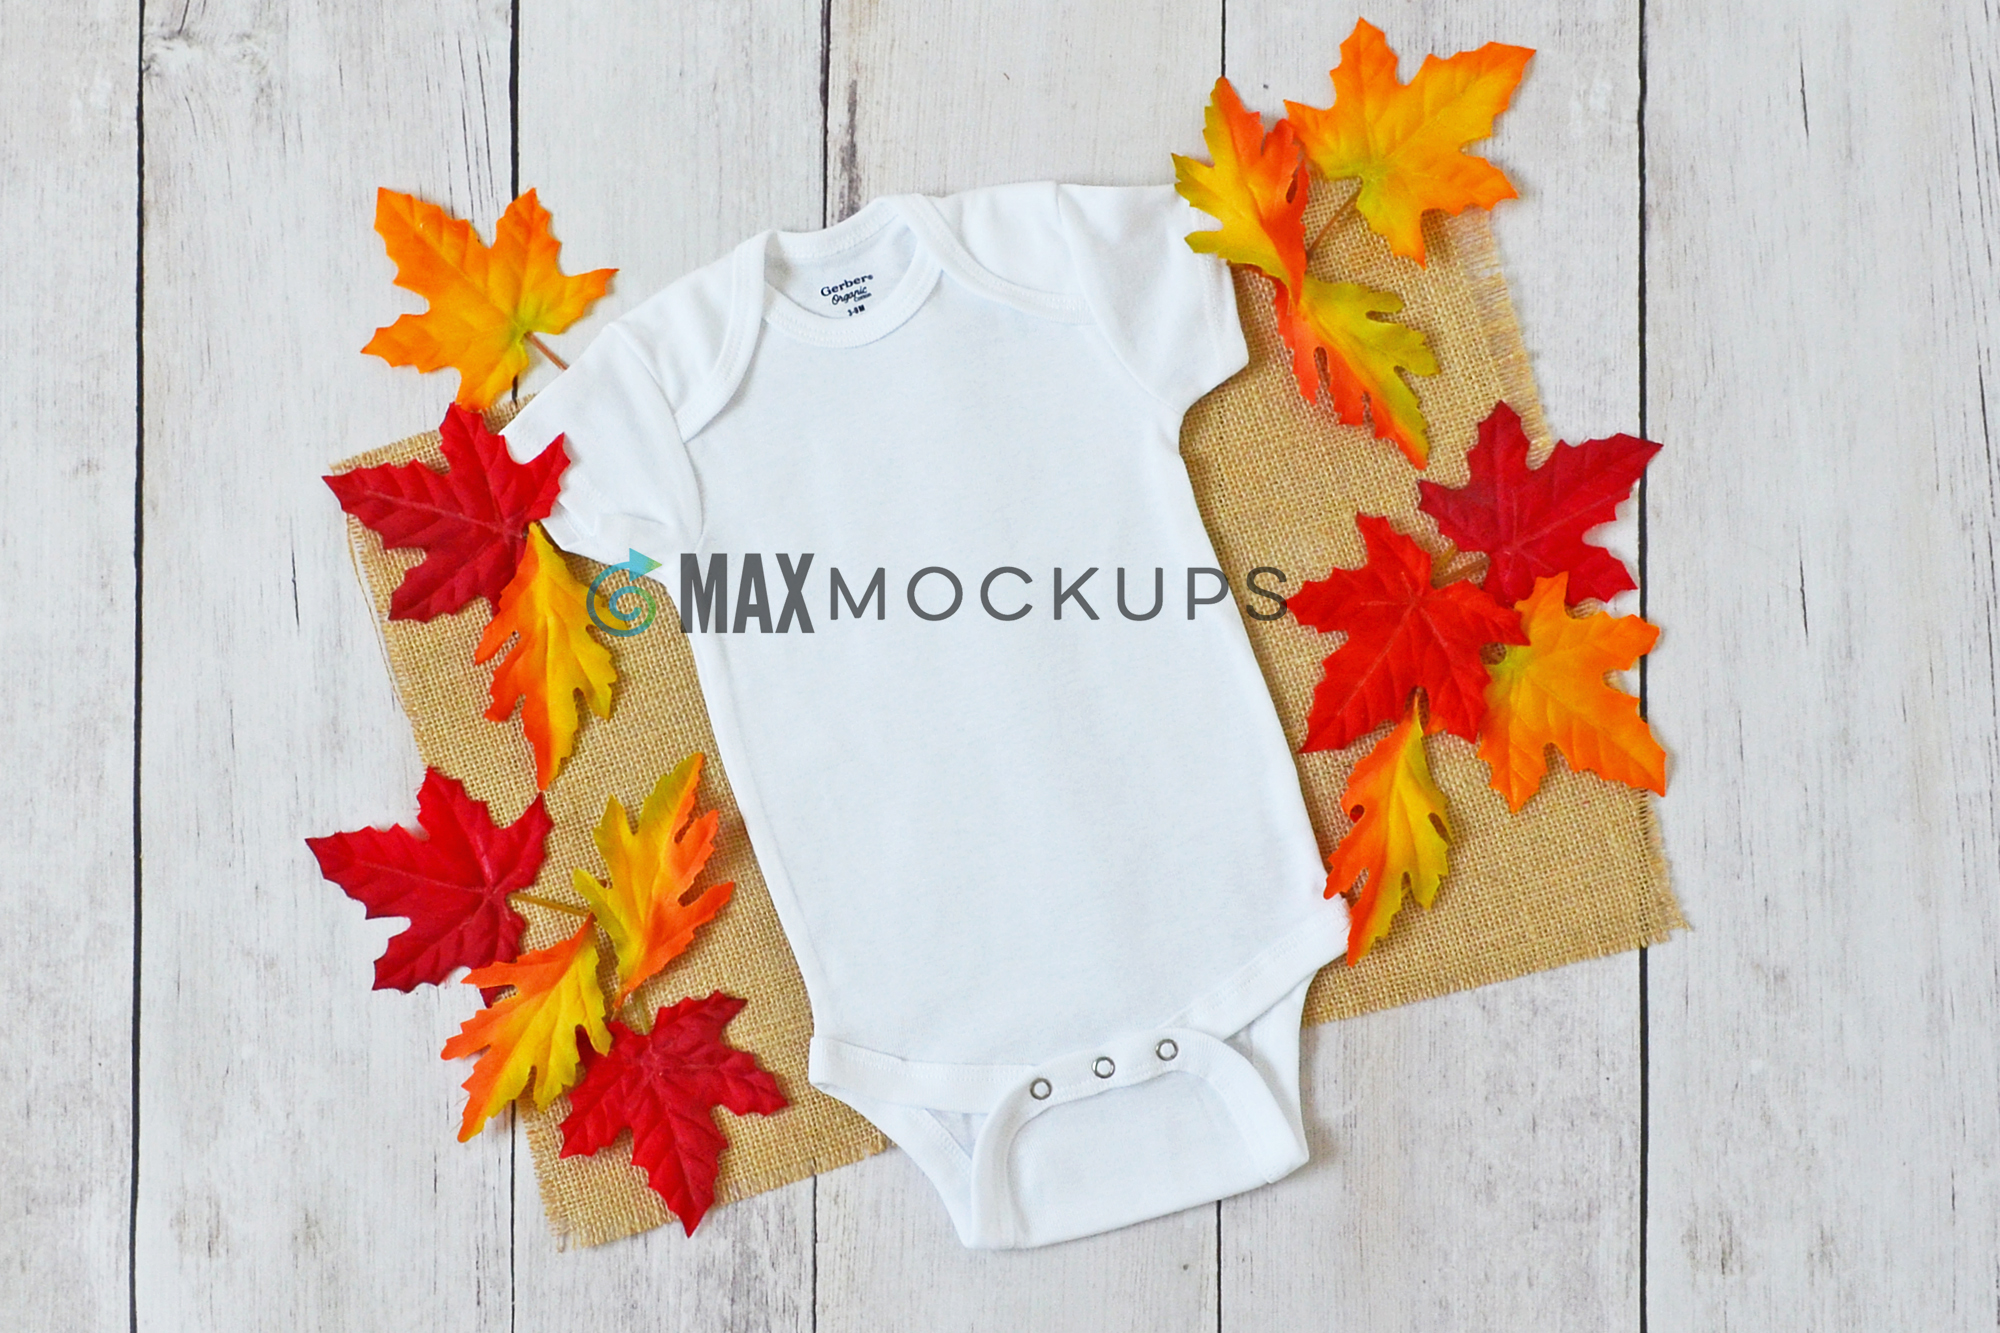 Baby bodysuit Mockup, Fall leaves, flatlay stock photo example image 1